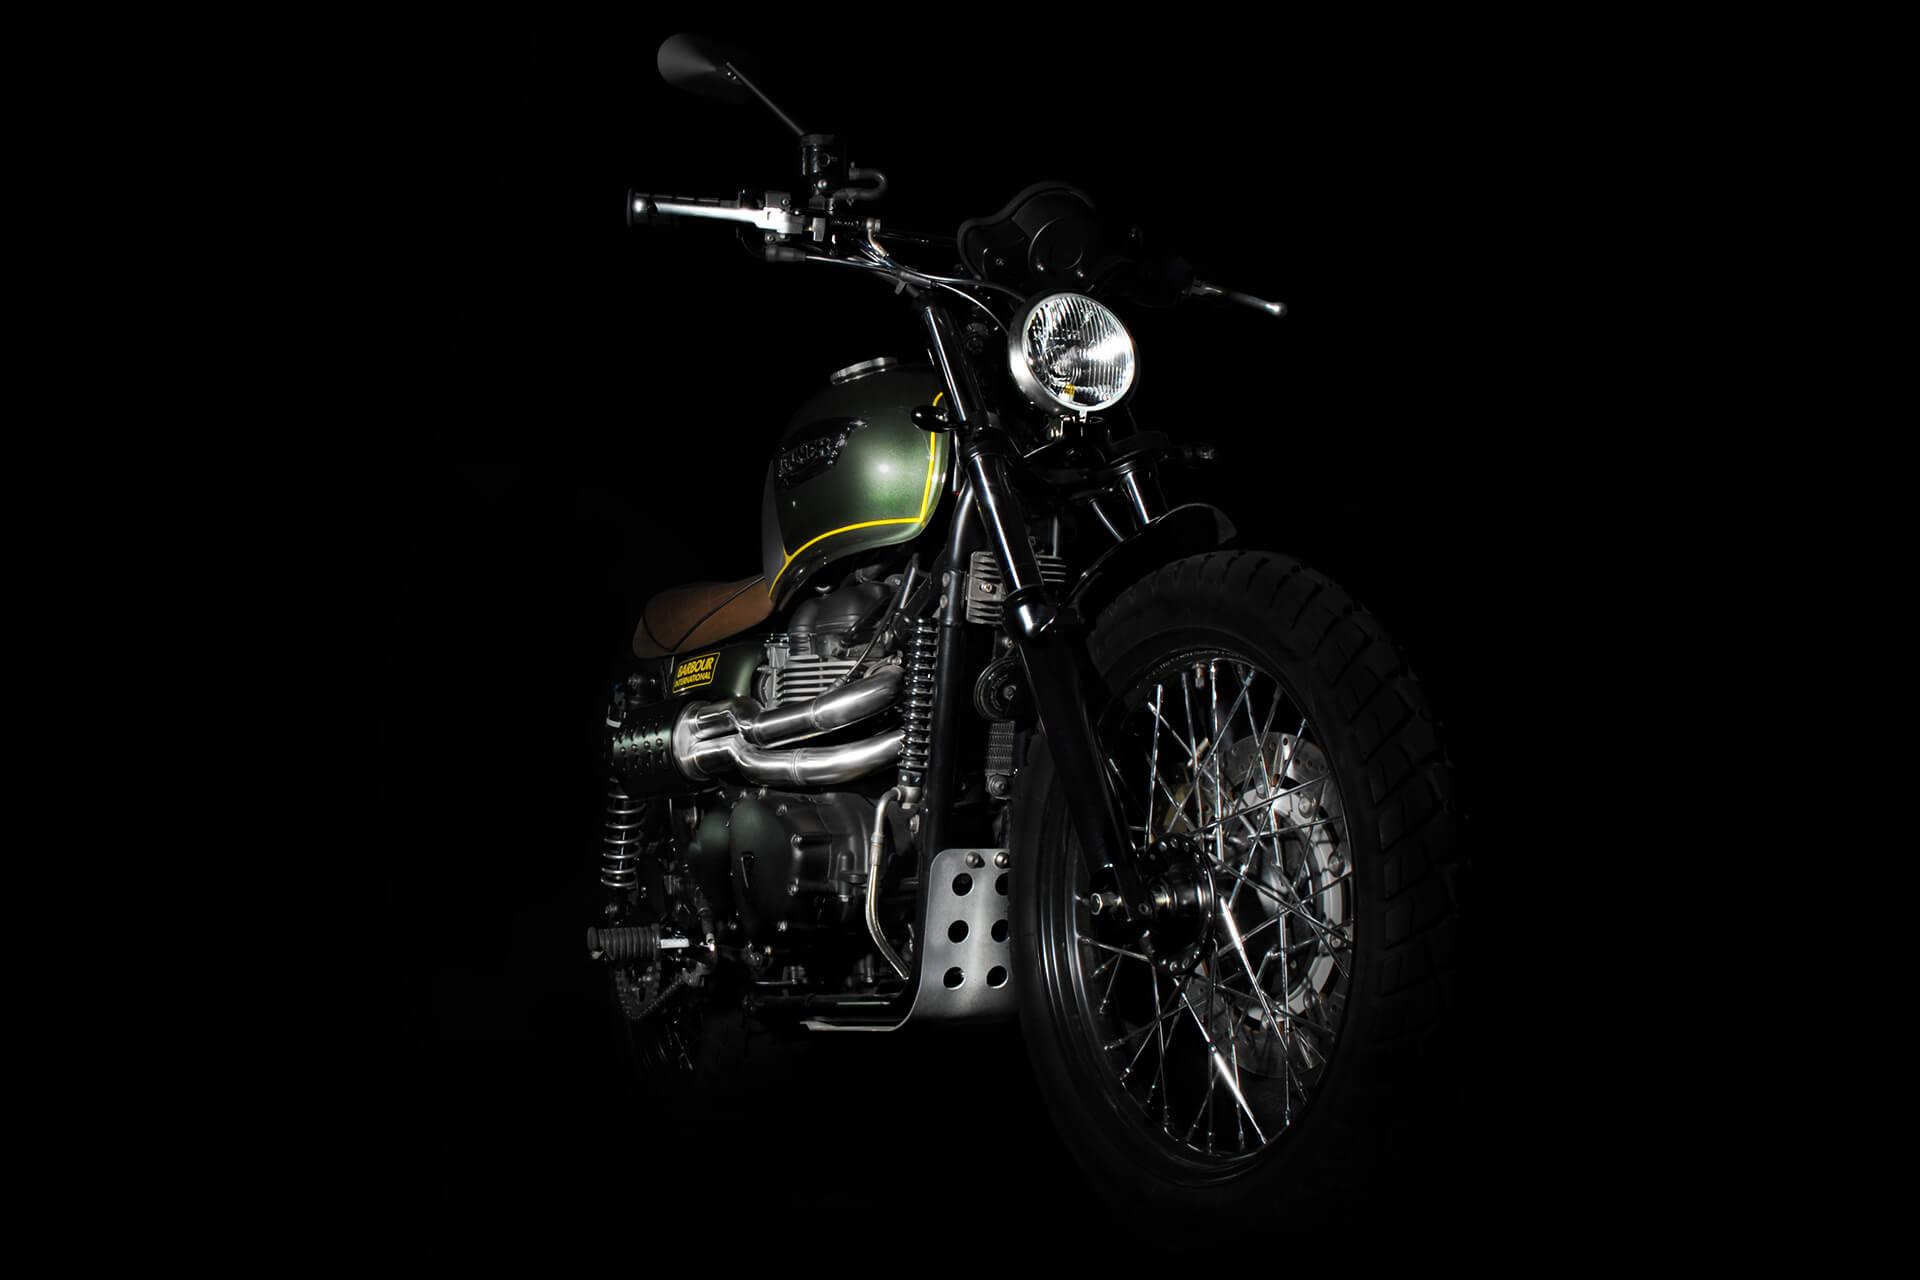 A225, Scrambler, Barbour, Barbour International, Britain, British, Photography, Film, WeAreShuffle, Biker, Motorcycle, Leather, Breaks, Break Discs, Triumph, Front